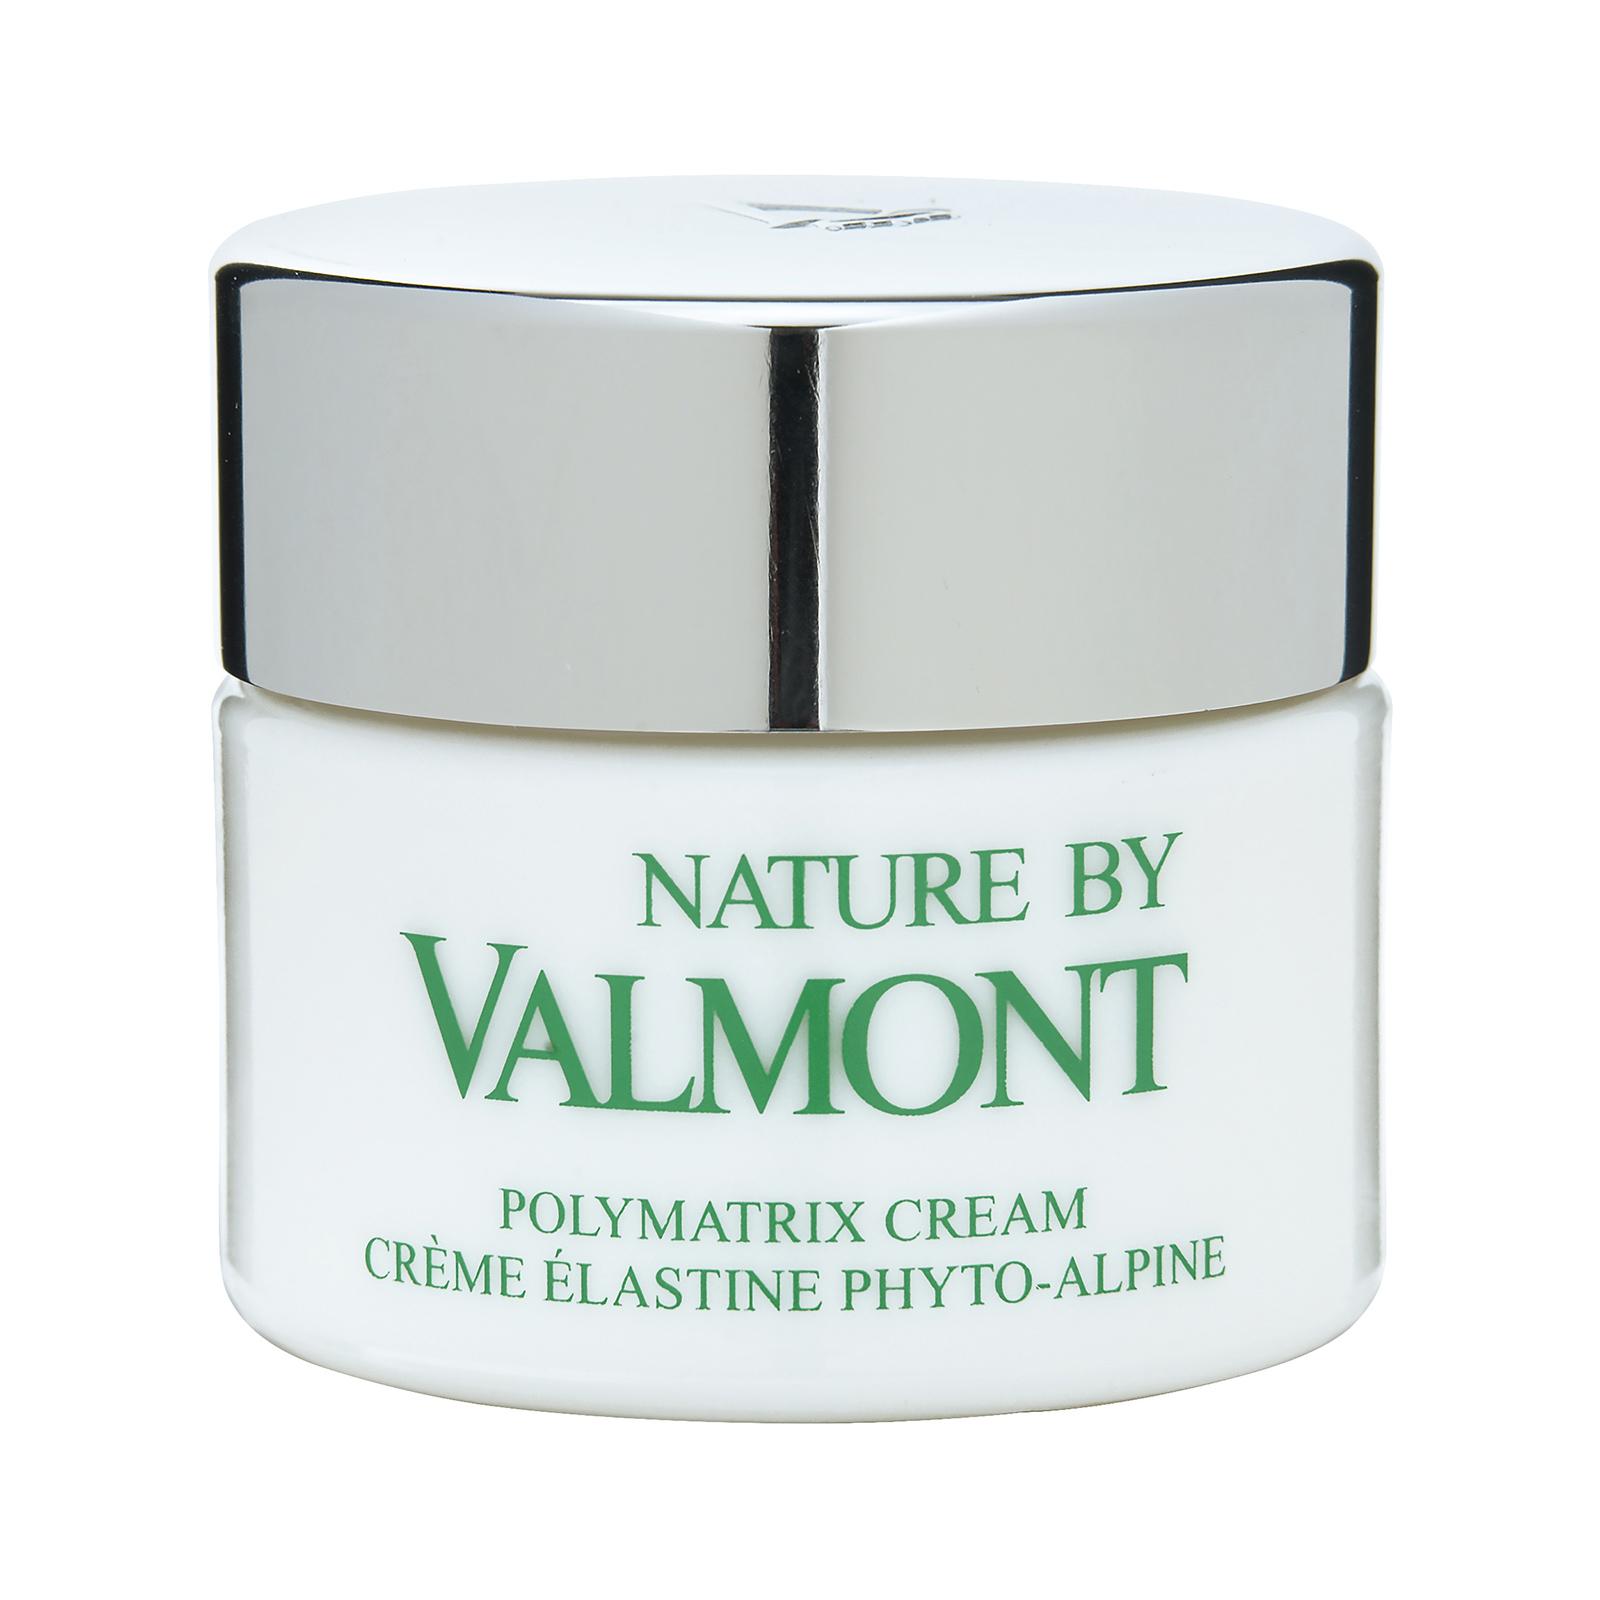 Valmont Nature by Valmont  Polymatrix Cream 1.7oz, 50ml